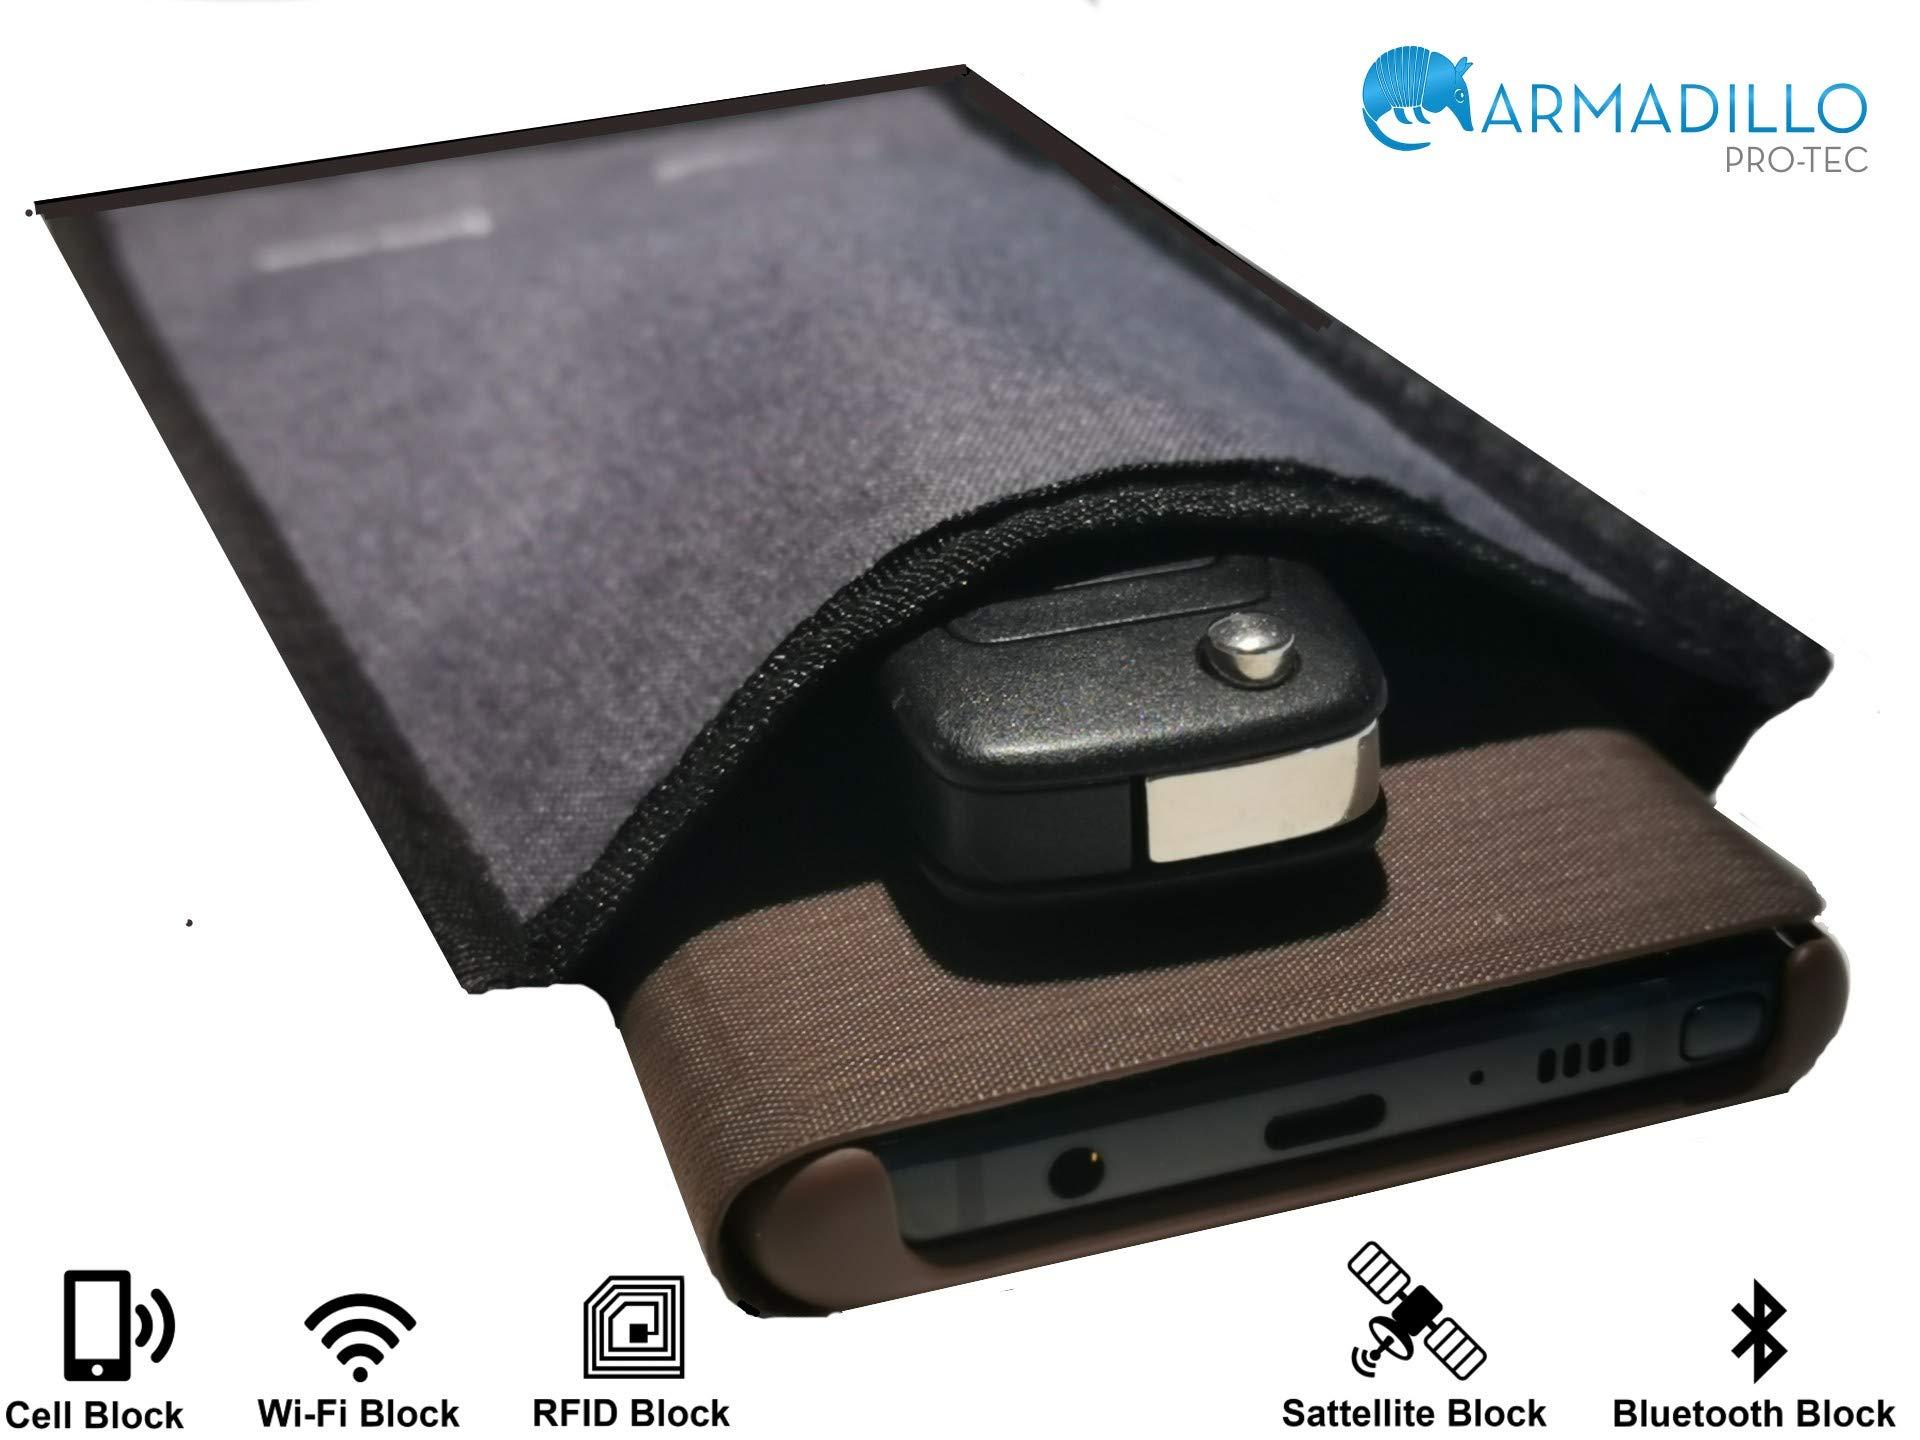 Armadillo Pro-Tec Faraday Bag Cell Phone & Car Key Fob Protector - RFID Signal Blocker and Faraday Cage - Anti-Car Theft, Anti-Hacking & Anti-Tracking